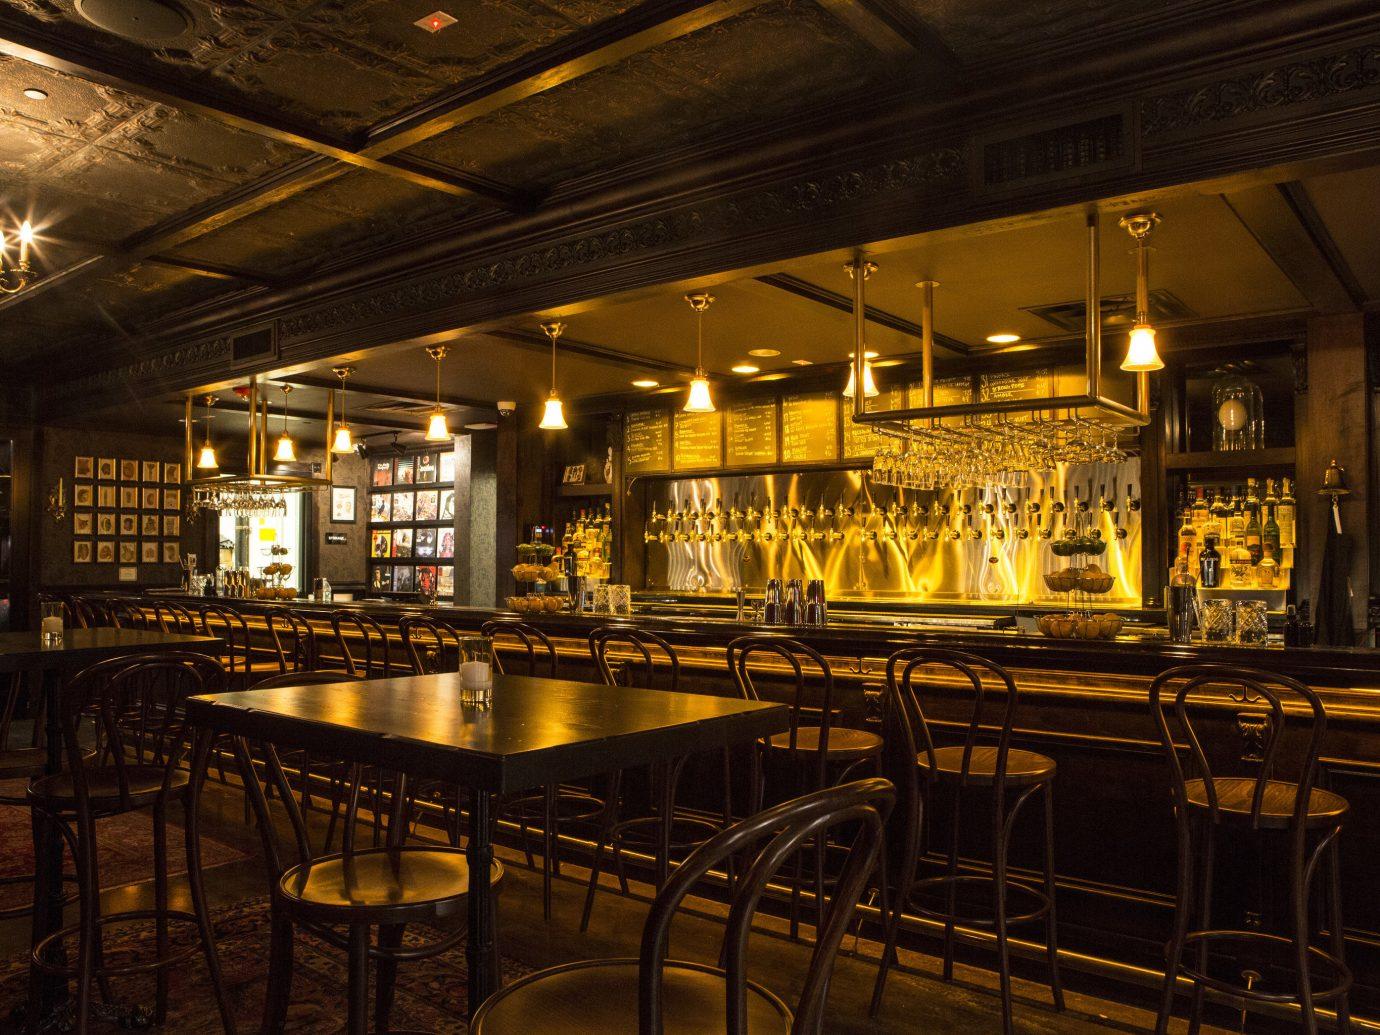 Arts + Culture ceiling indoor building Bar night restaurant metal lighting interior design estate several dining room